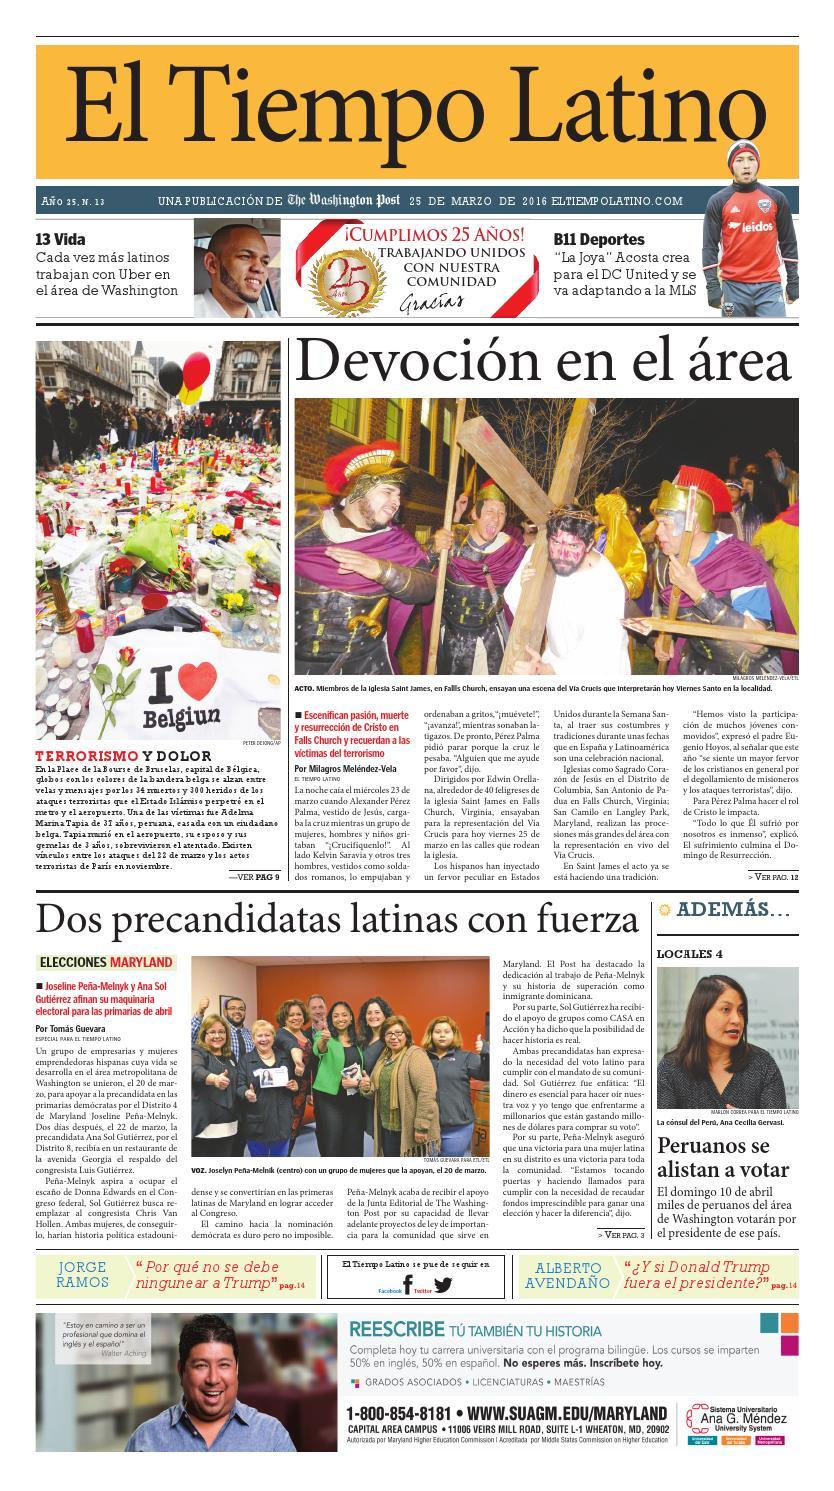 ETL 3-25-16 by El Tiempo Latino /TWP - issuu